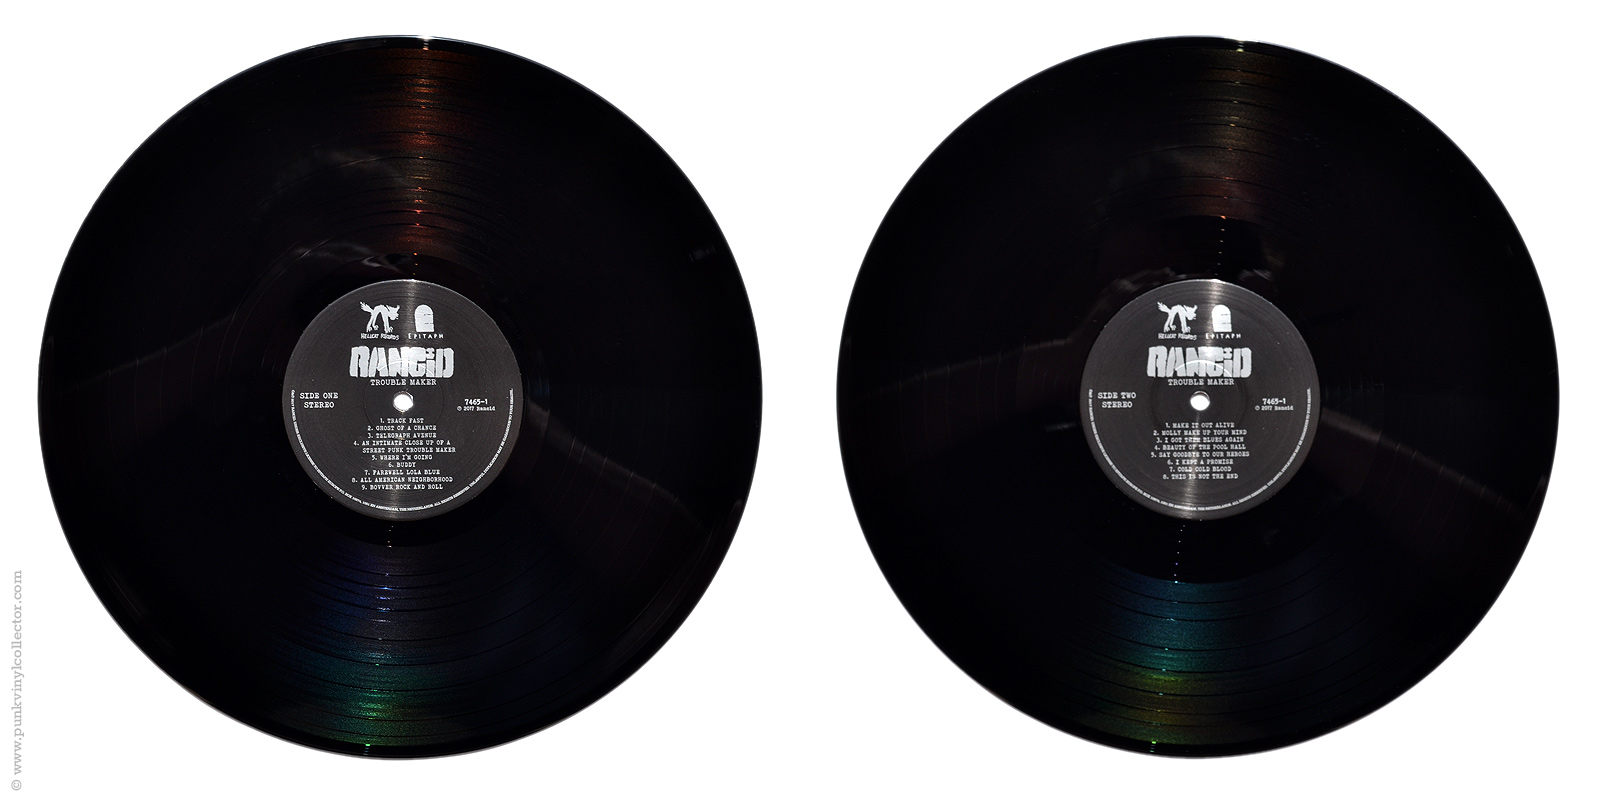 Rancid Punk Vinyl Collector